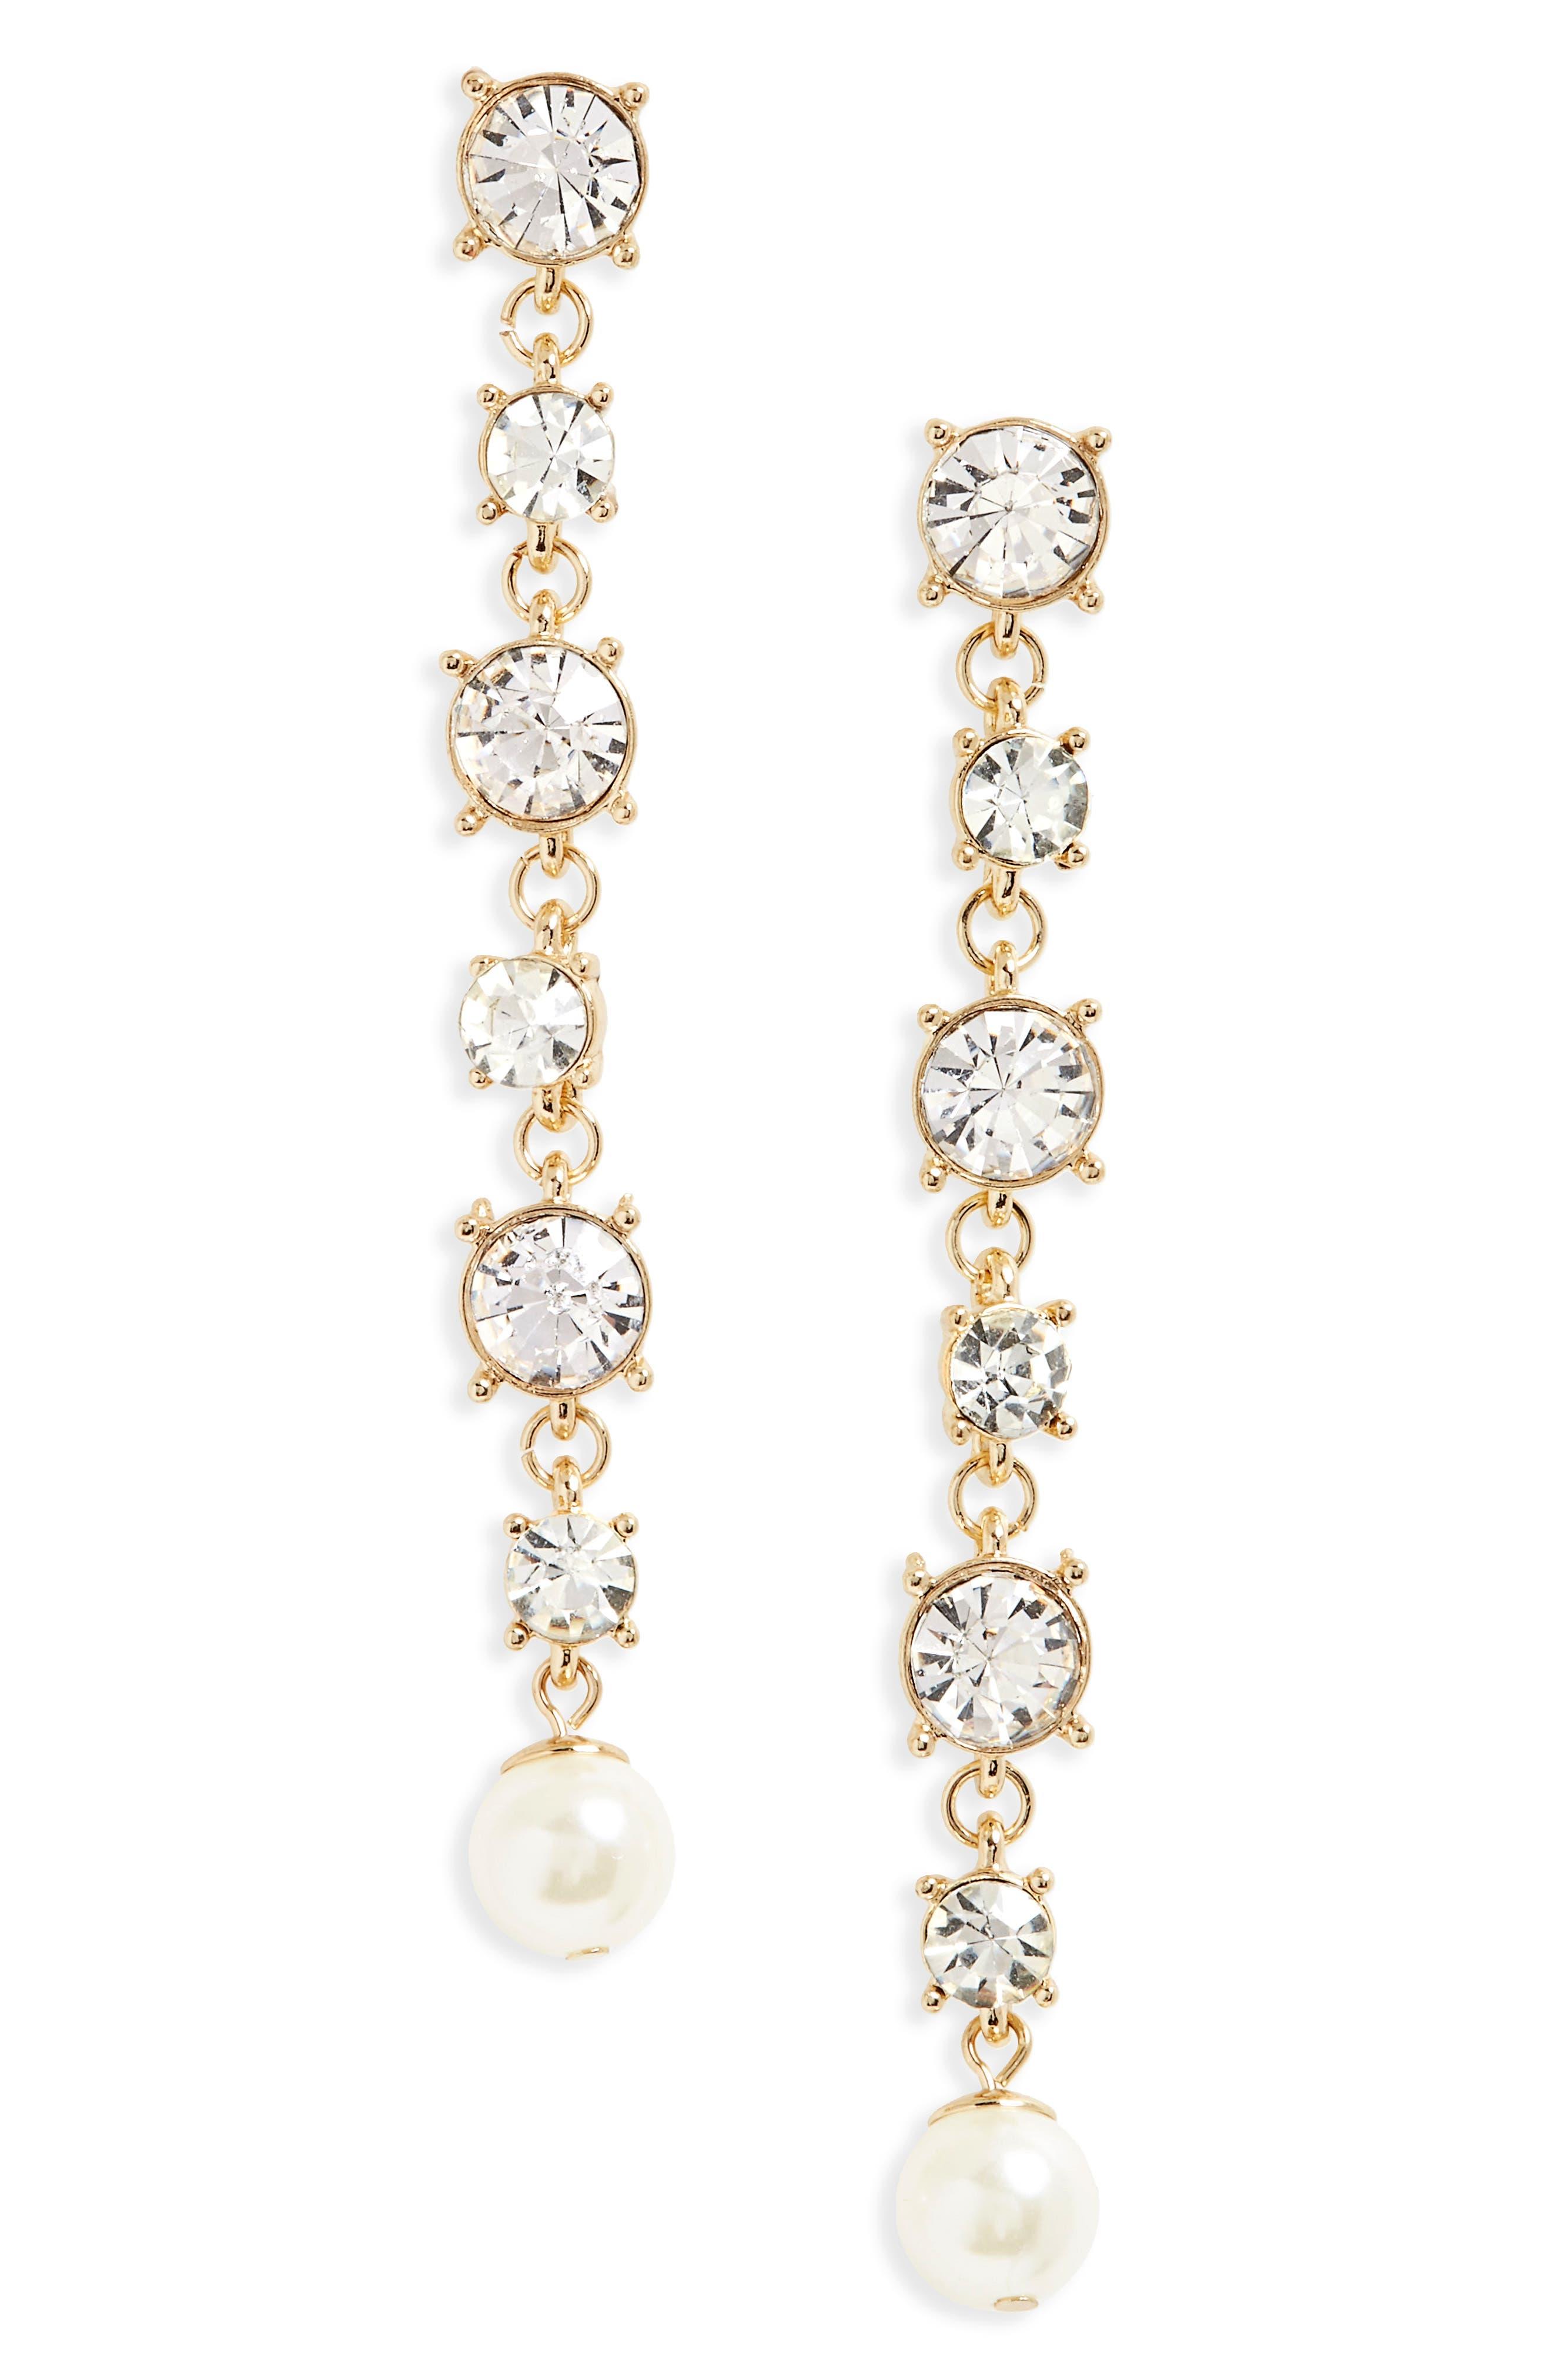 Alternate Image 1 Selected - Girly Crystal & Imitation Pearl Drop Earrings